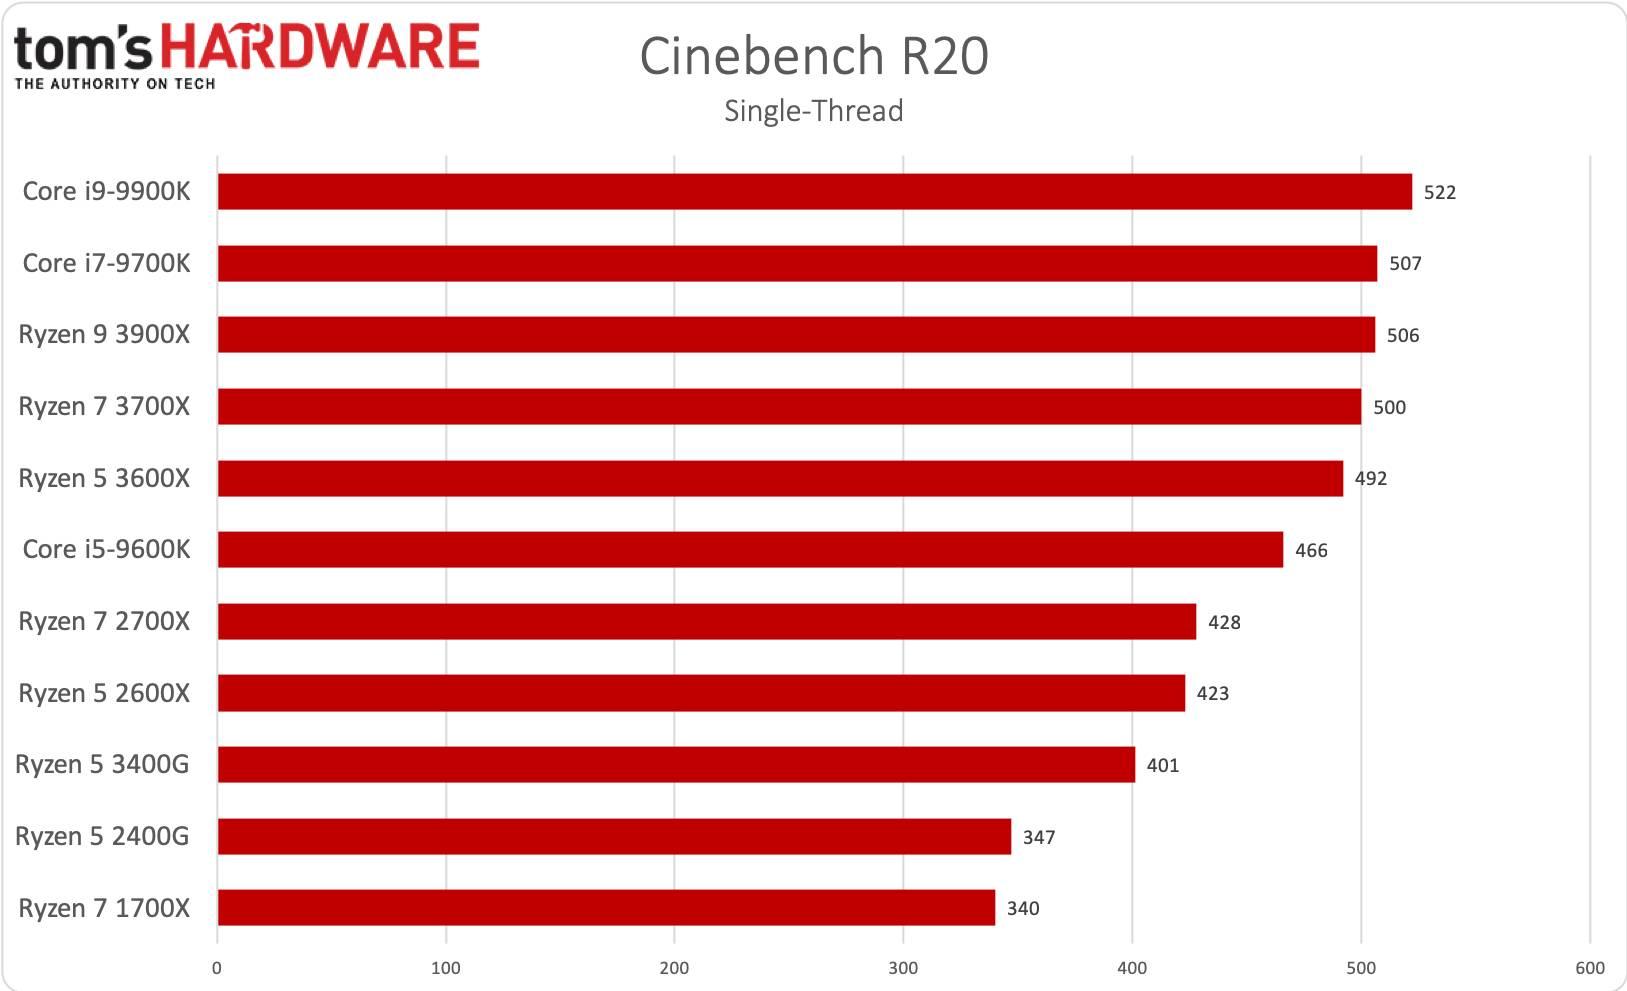 Ryzen 5 3400G Cinebench R20 single-thread